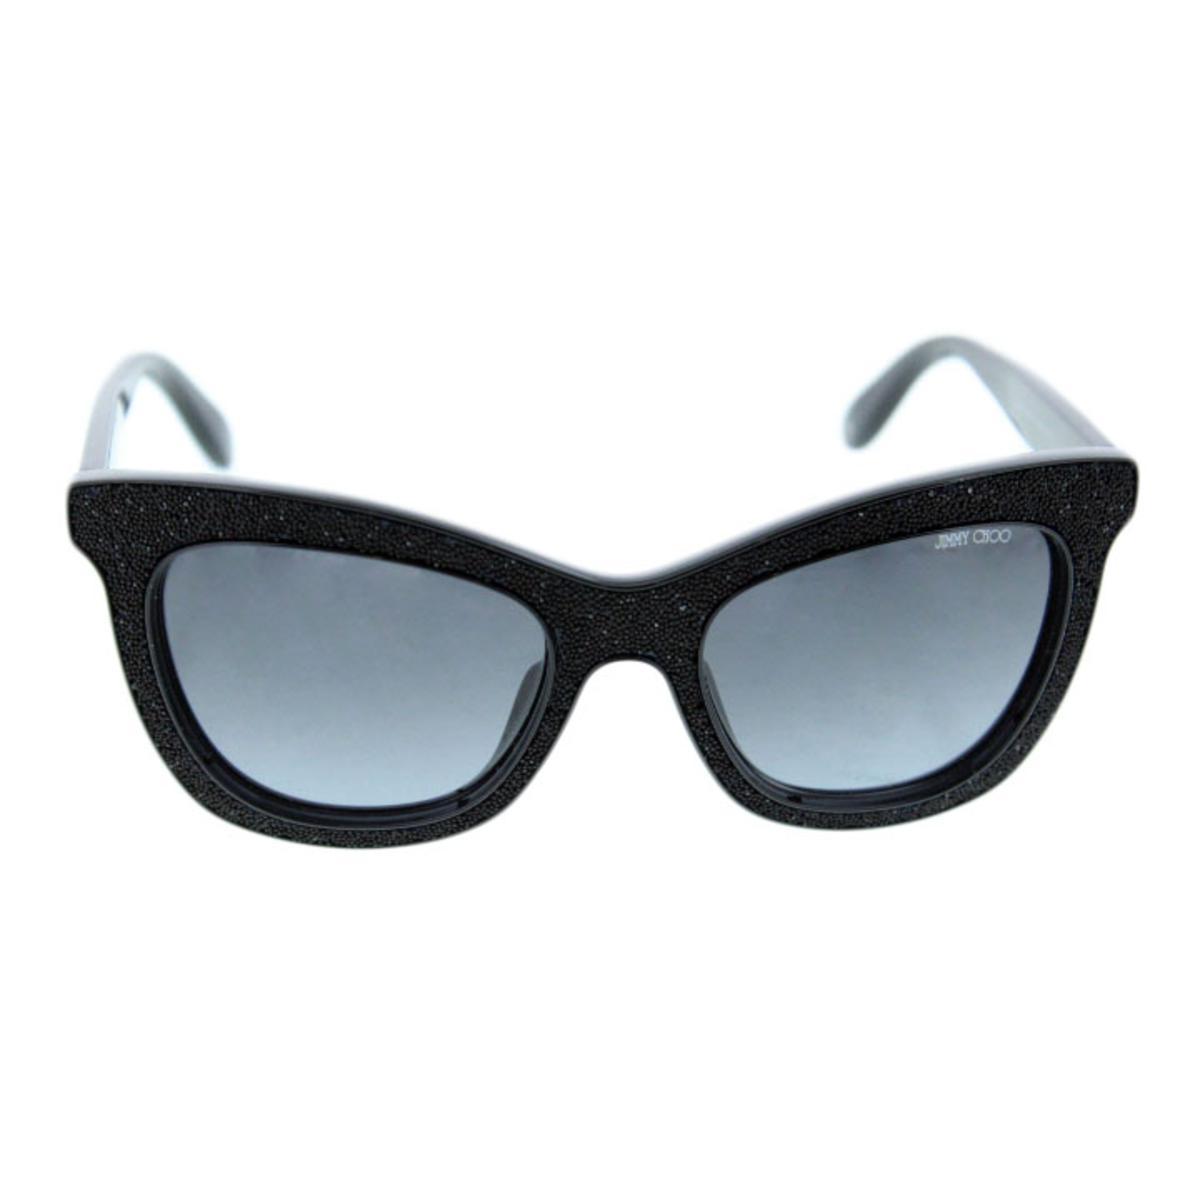 Jimmy Choo Flash 6170 Feminino Preto Cristais Swarovski Cat Eye ... c2f525e3e1